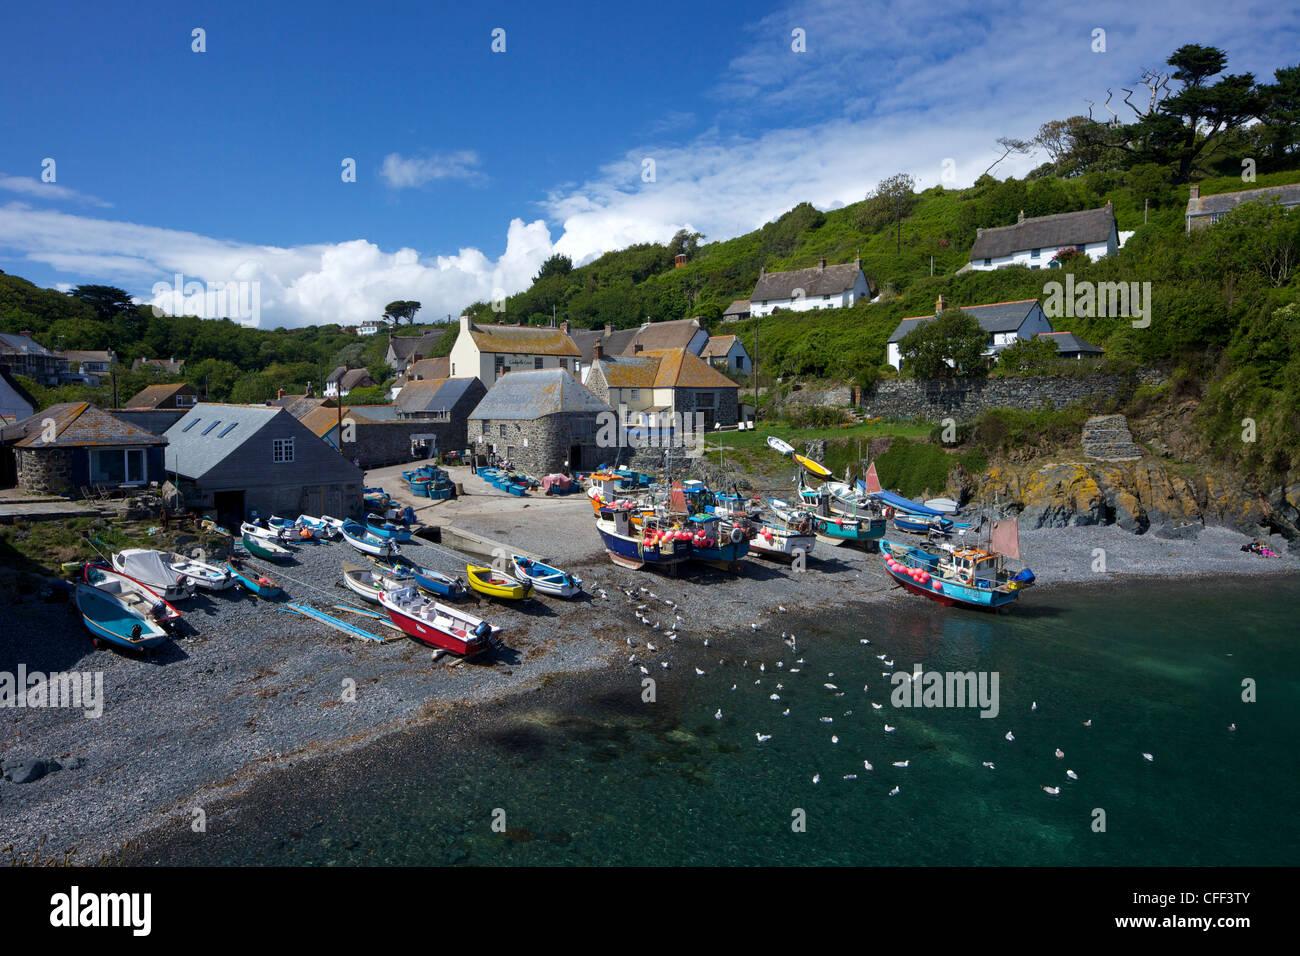 Fishing boats on the beach at Cadgwith, Lizard Peninsula, Cornwall, England, United Kingdom, Europe - Stock Image